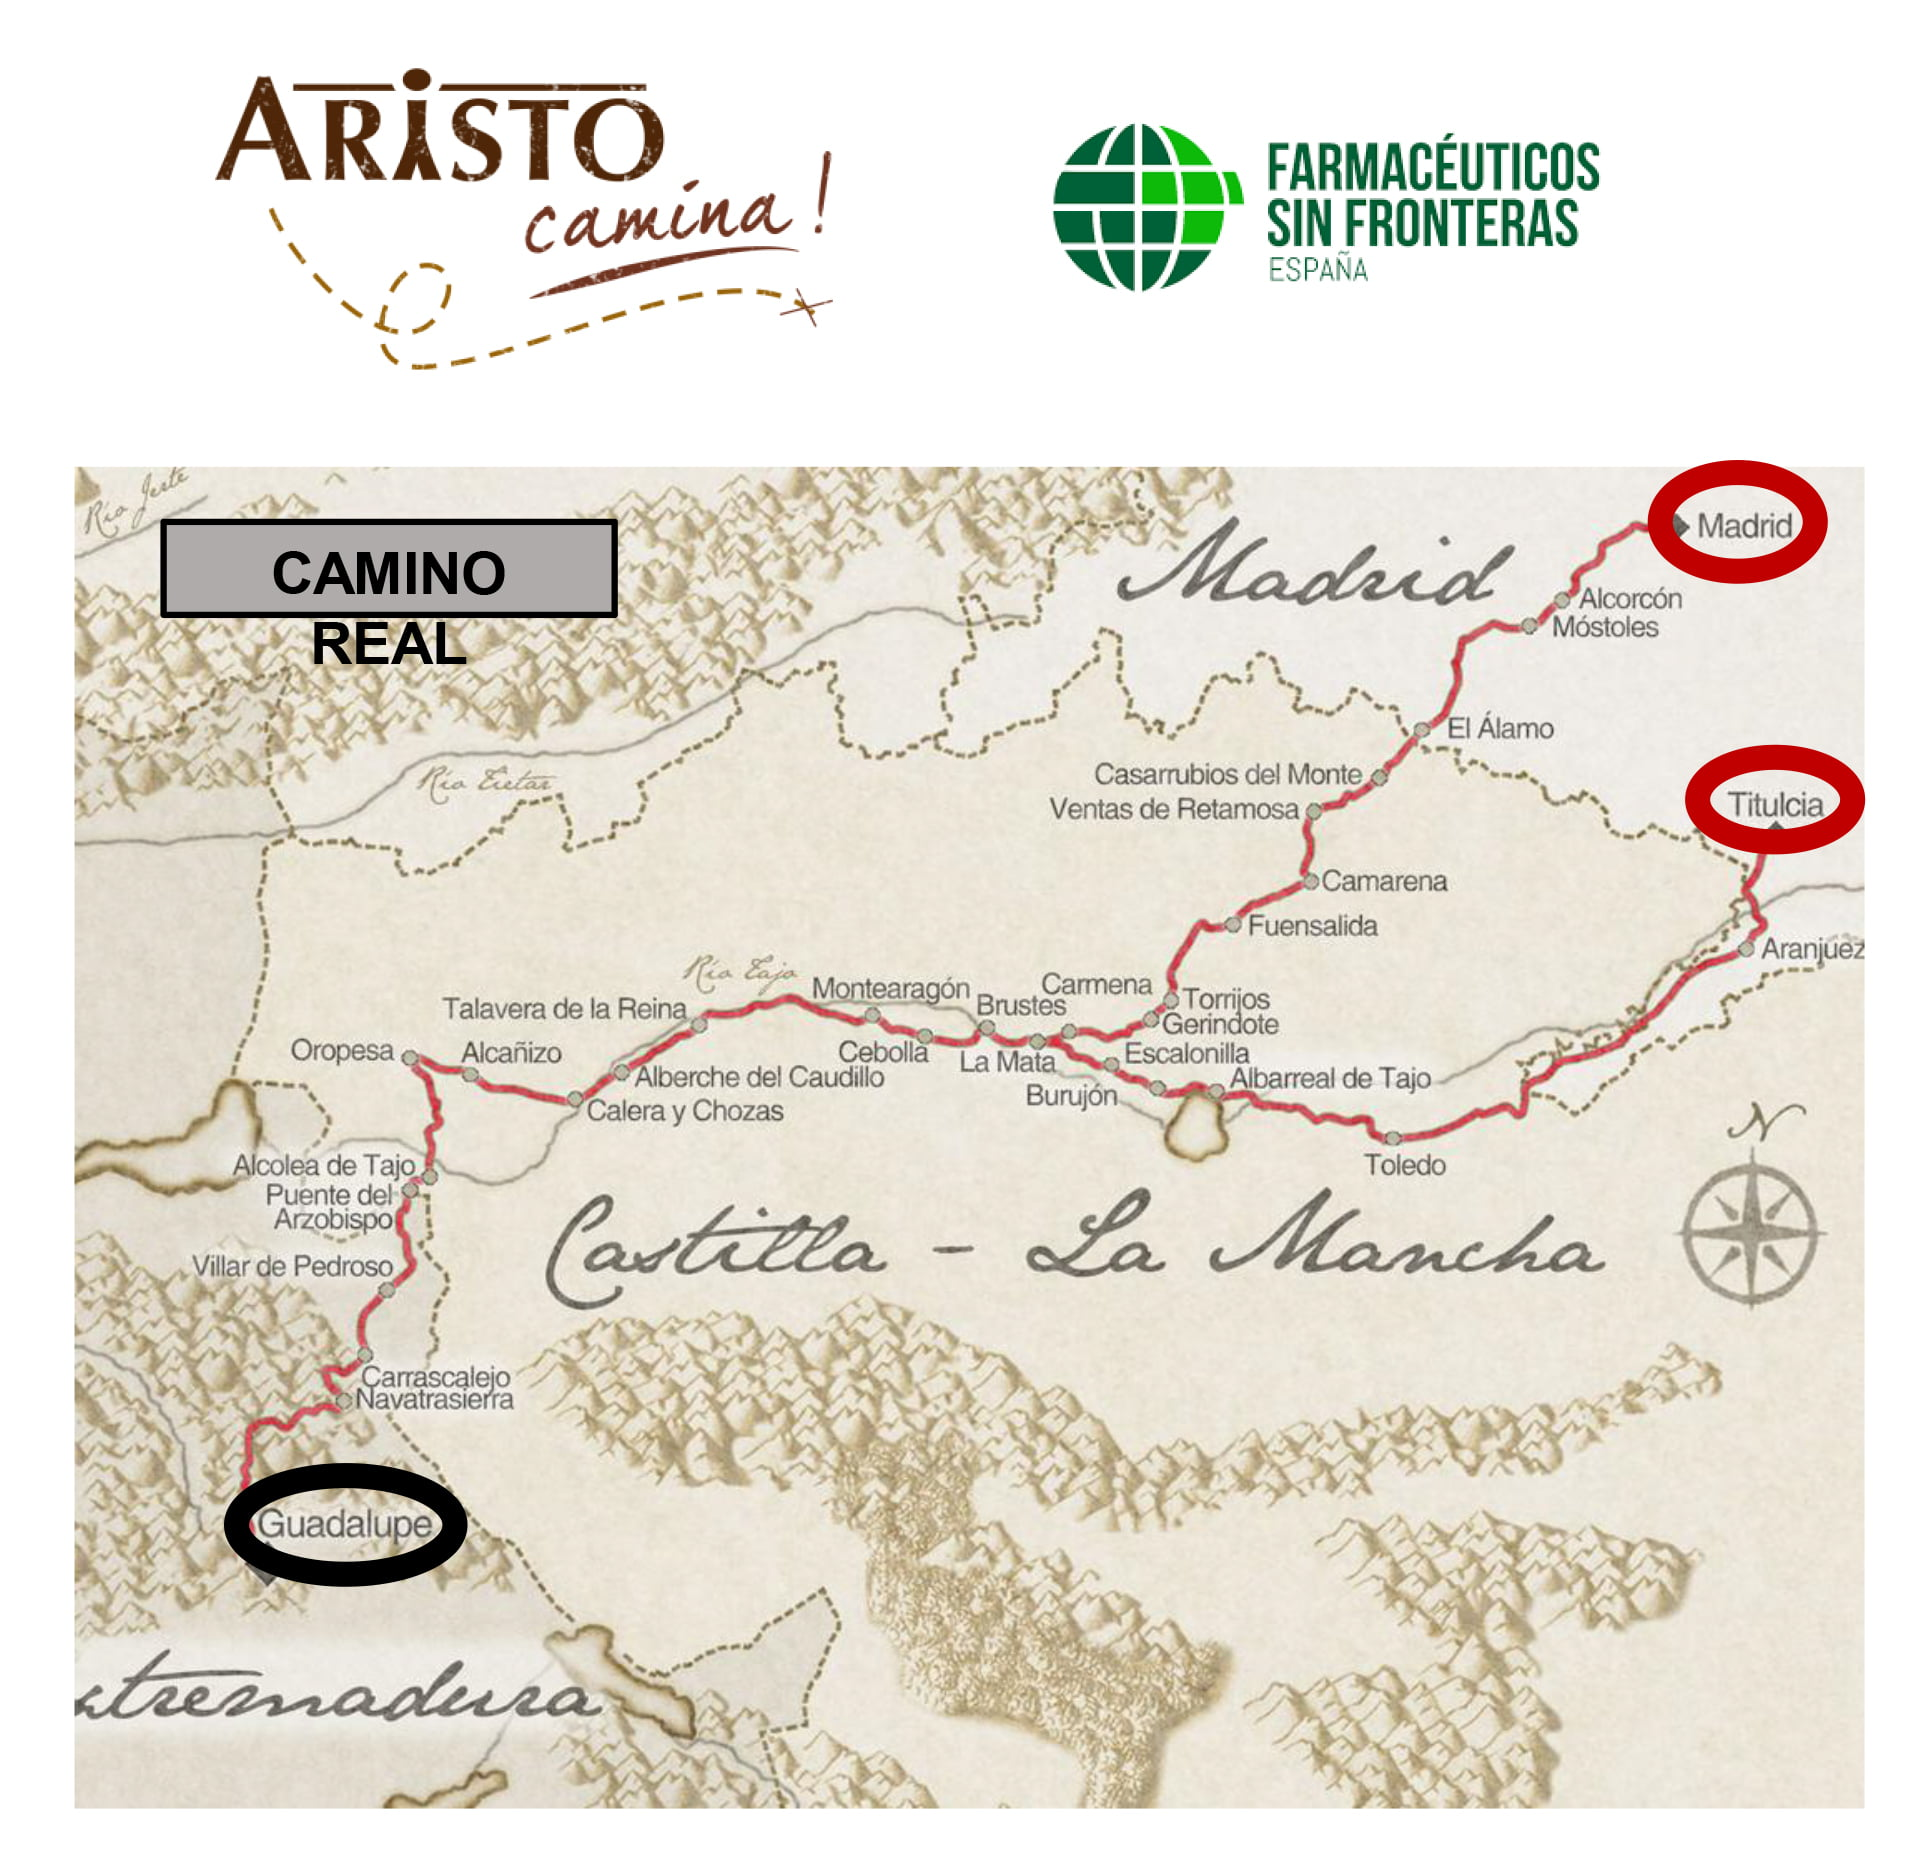 Aristo Camina